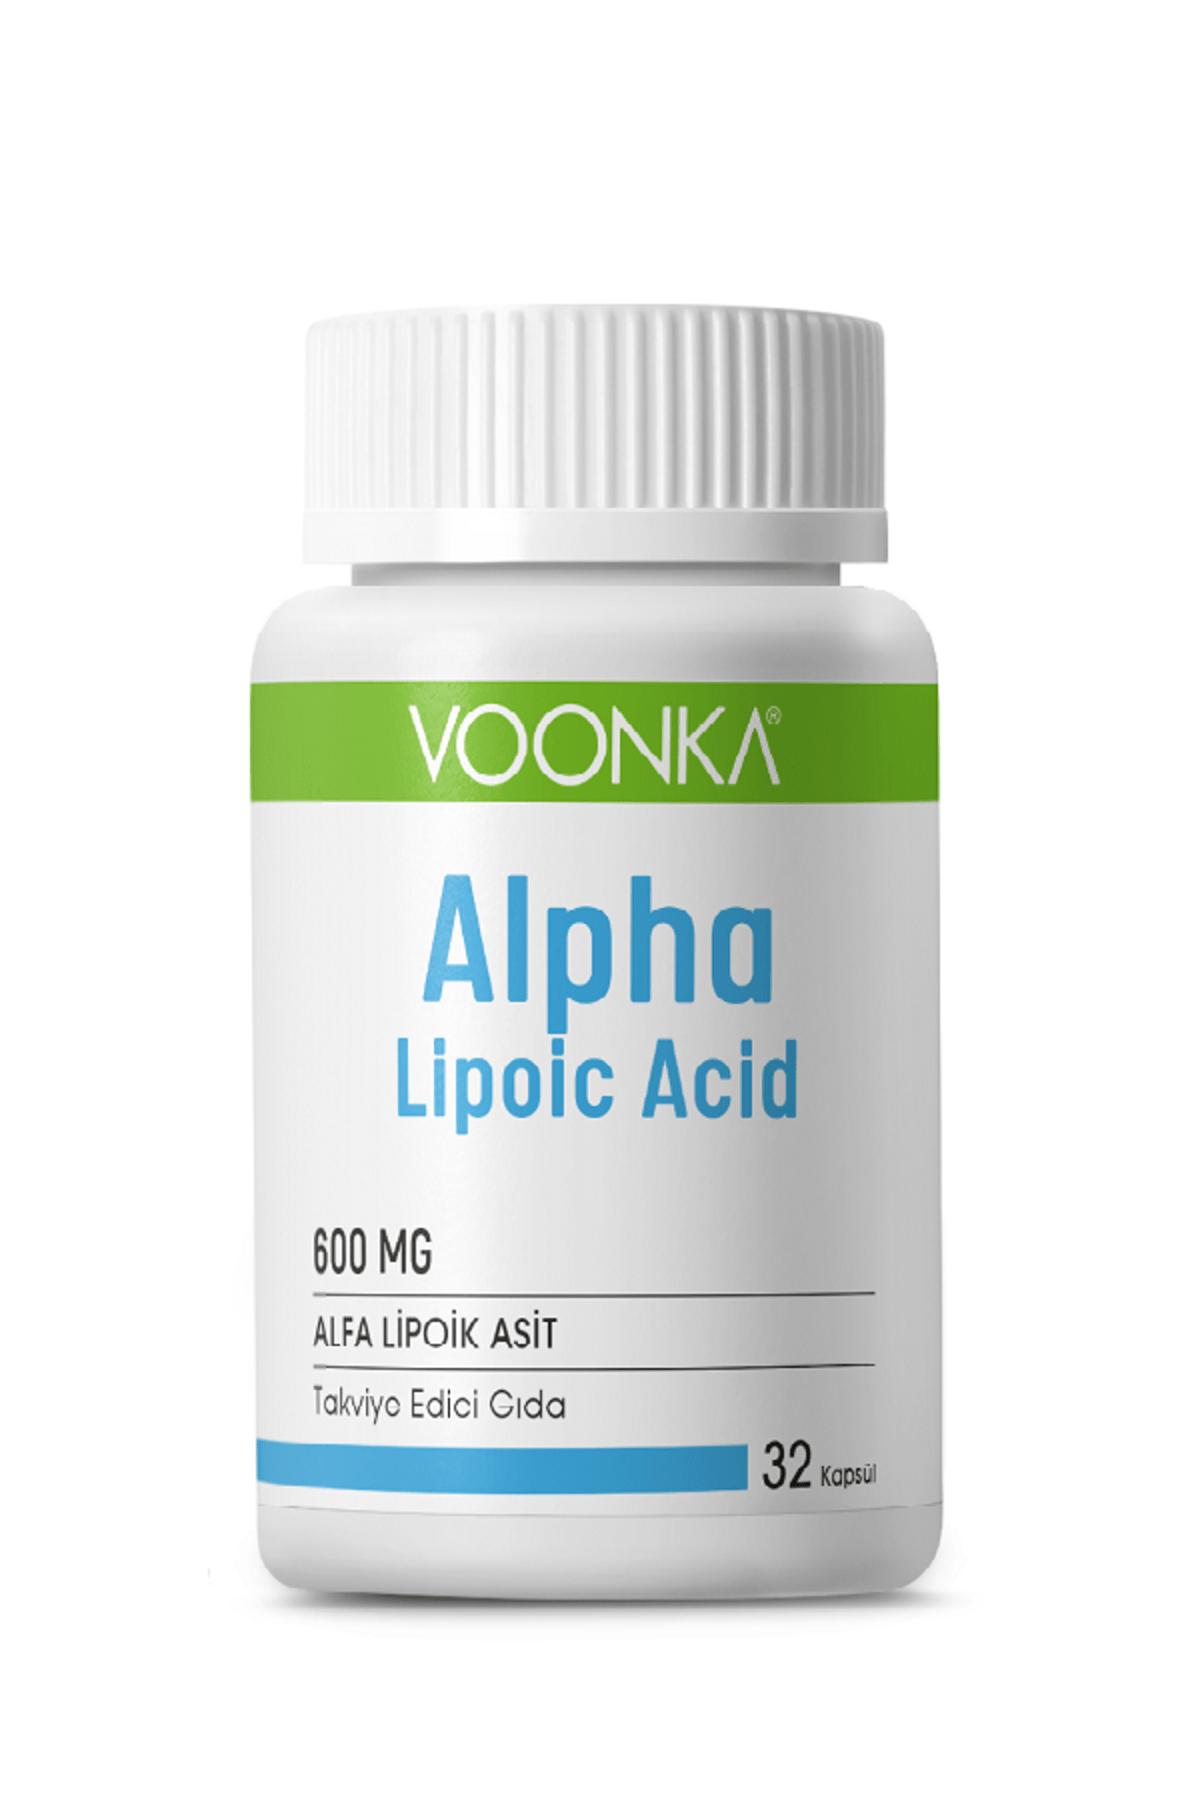 Voonka Alpha Lipoic Acid 600 Mg 32 Kapsül Skt:03/2021 0